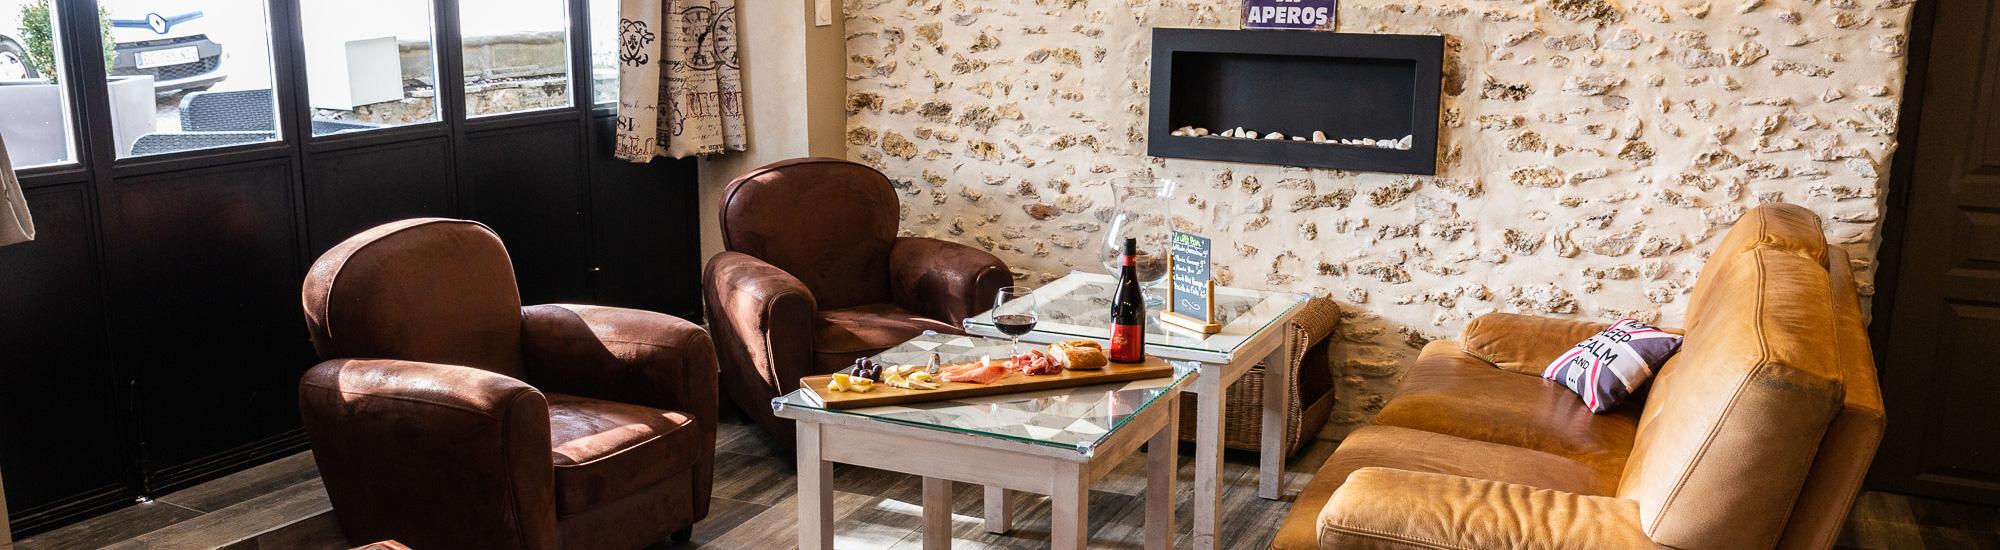 Espace Lounge - Auberge de la Garenne